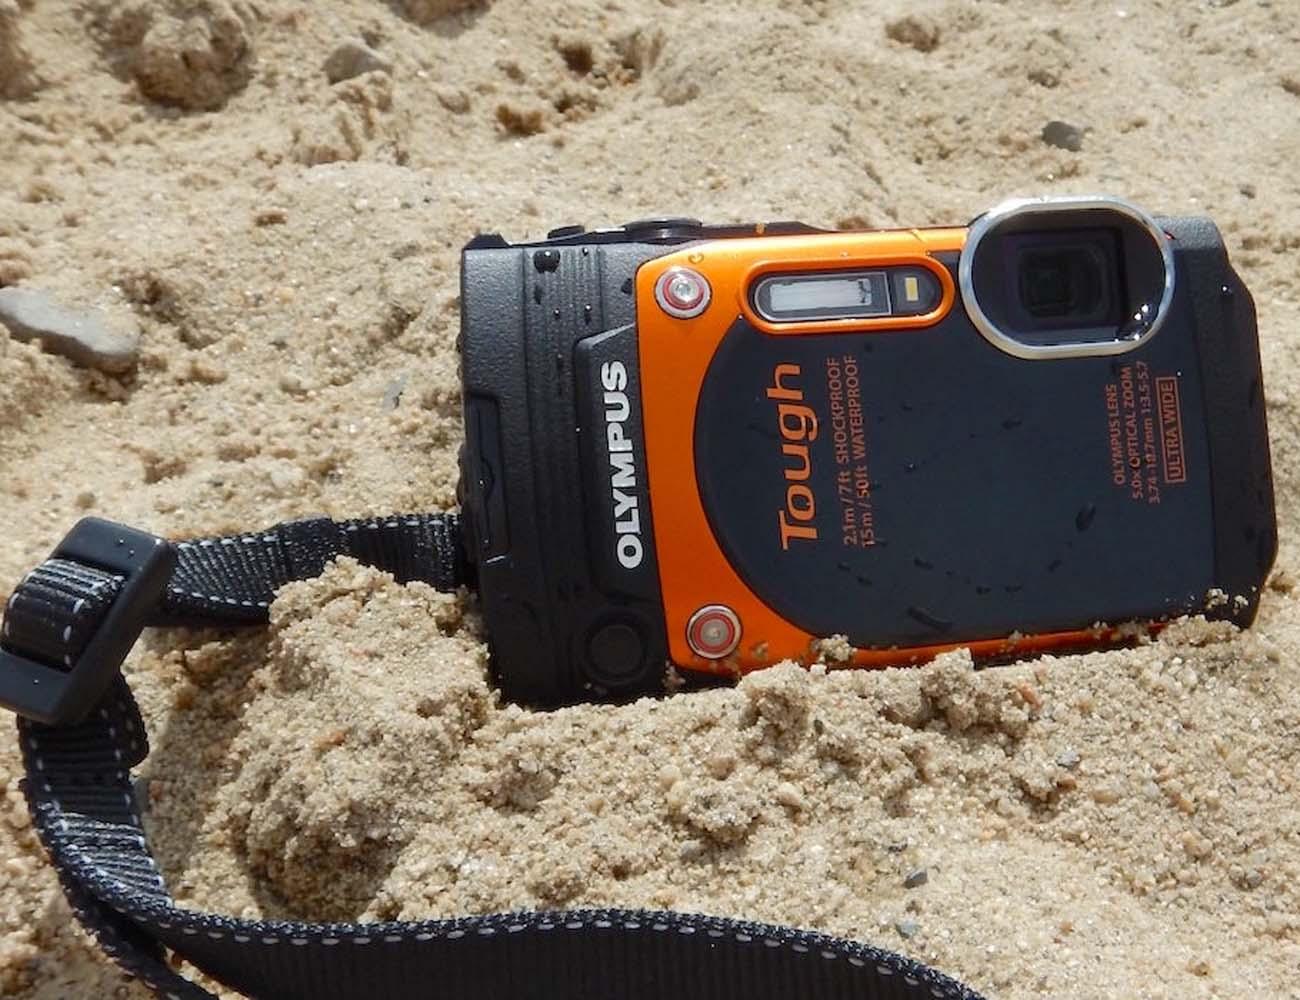 Olympus Stylus Tough TG-860 Rugged Camera